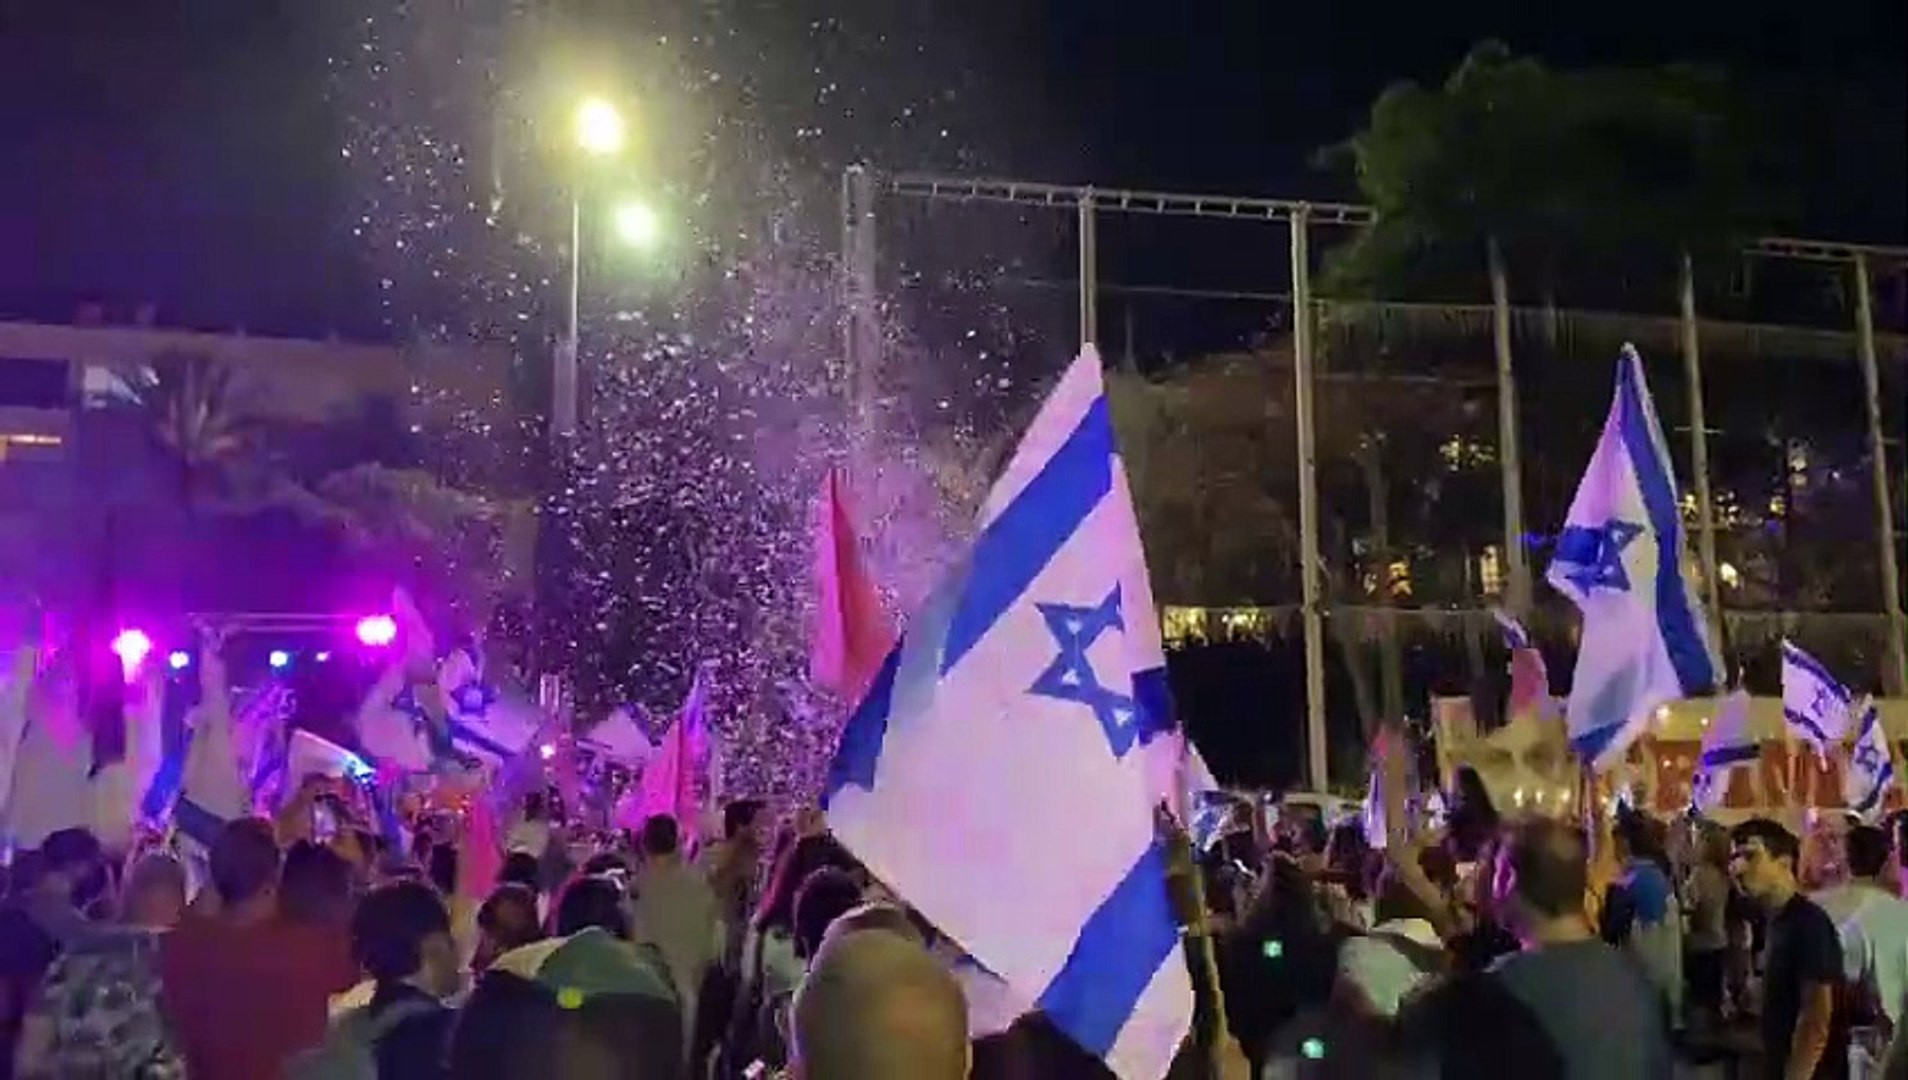 İsrailliler sokağa döküldü